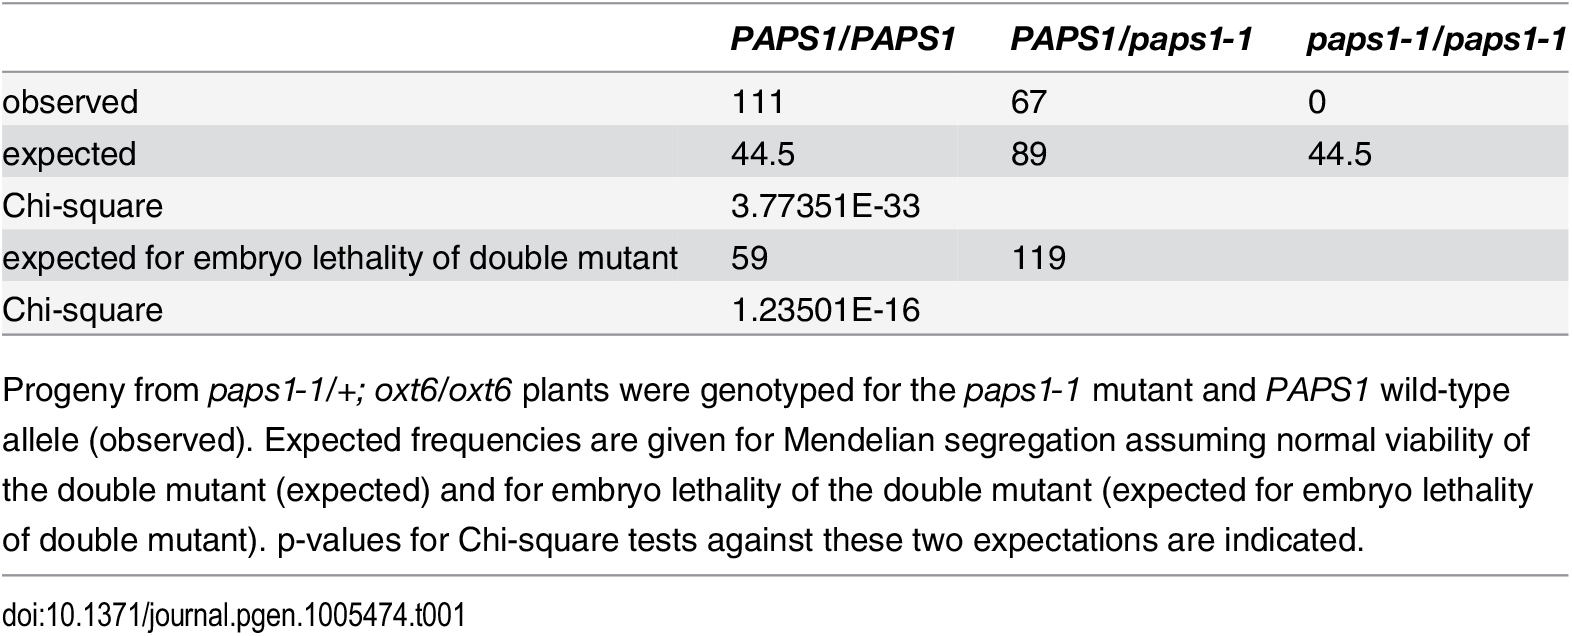 Distribution of <i>PAPS1</i> genotypes in the progeny of <i>paps1-1/+</i>; <i>oxt6/oxt6</i> plants.